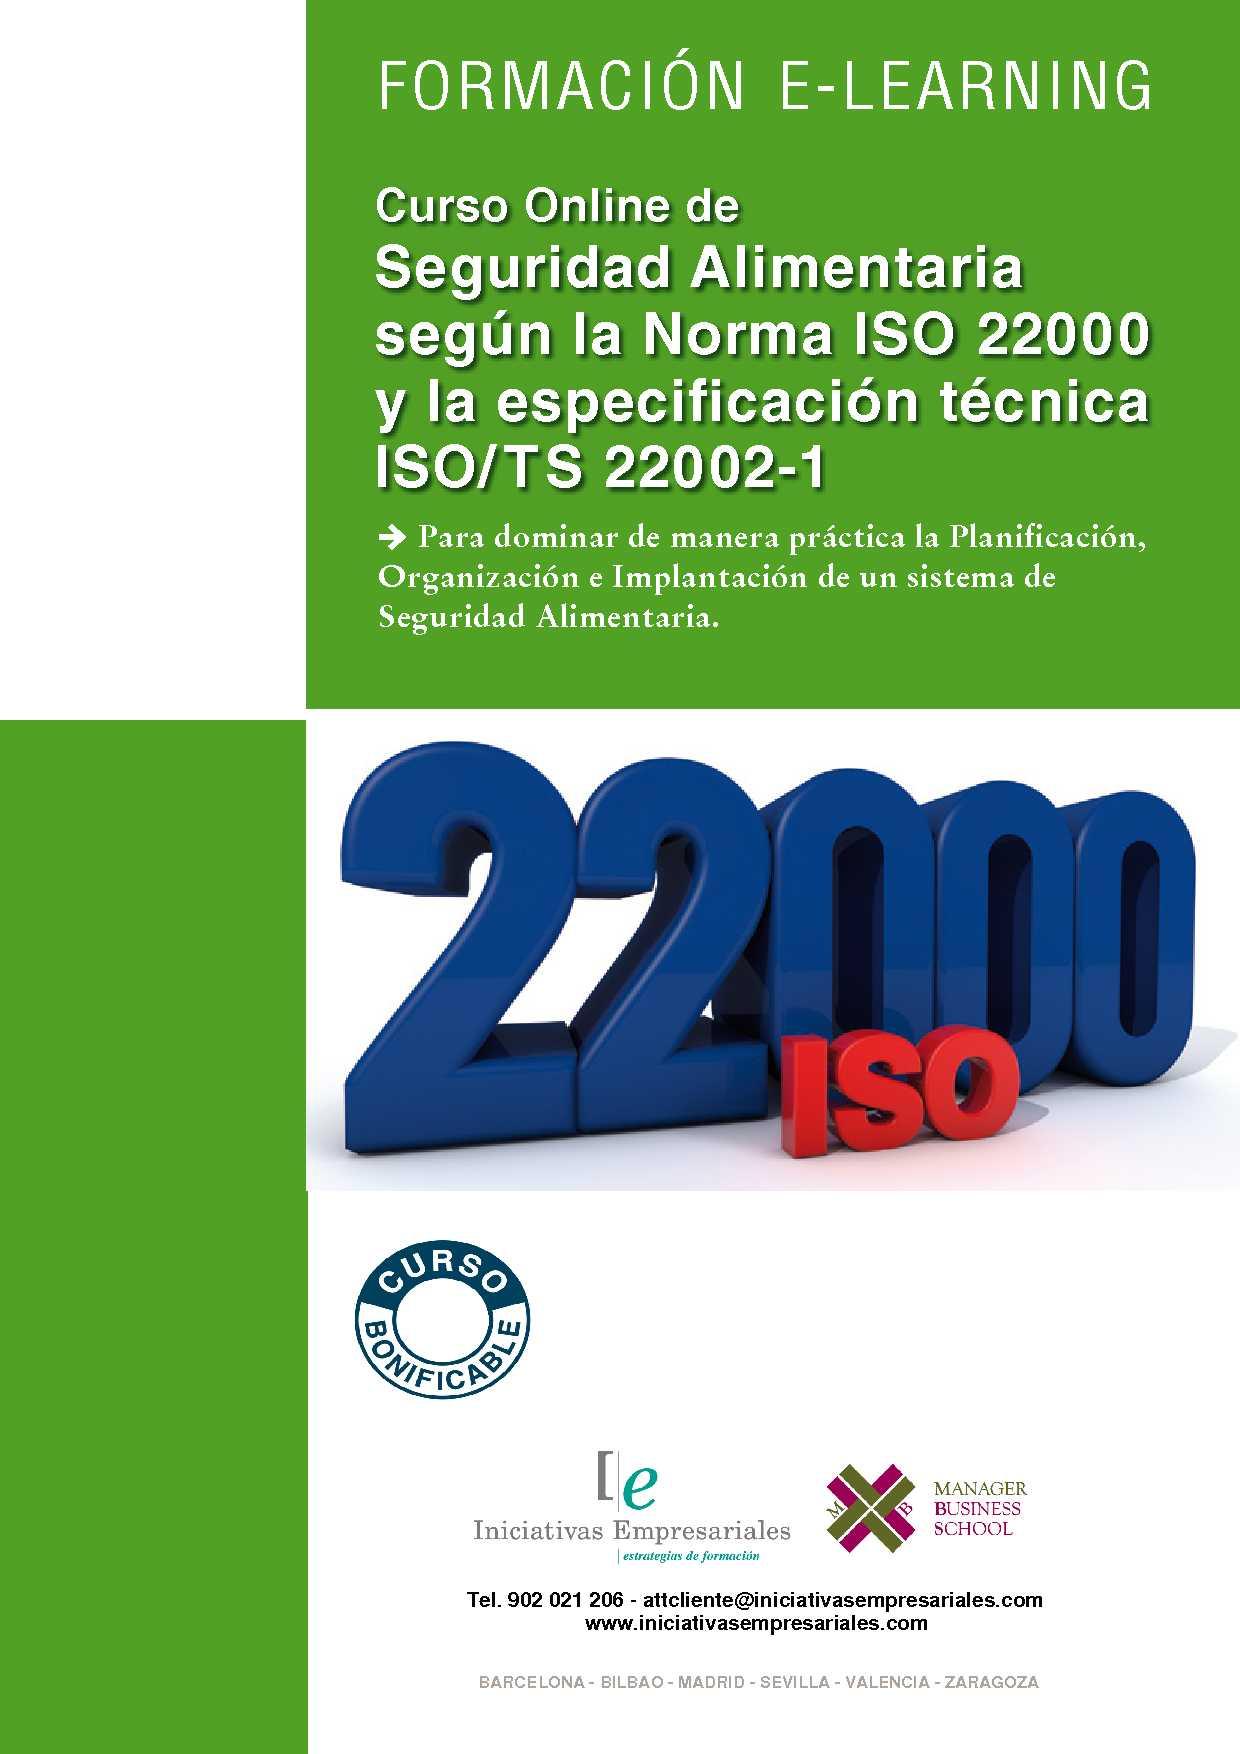 iso ts 22002-4 espaol pdf